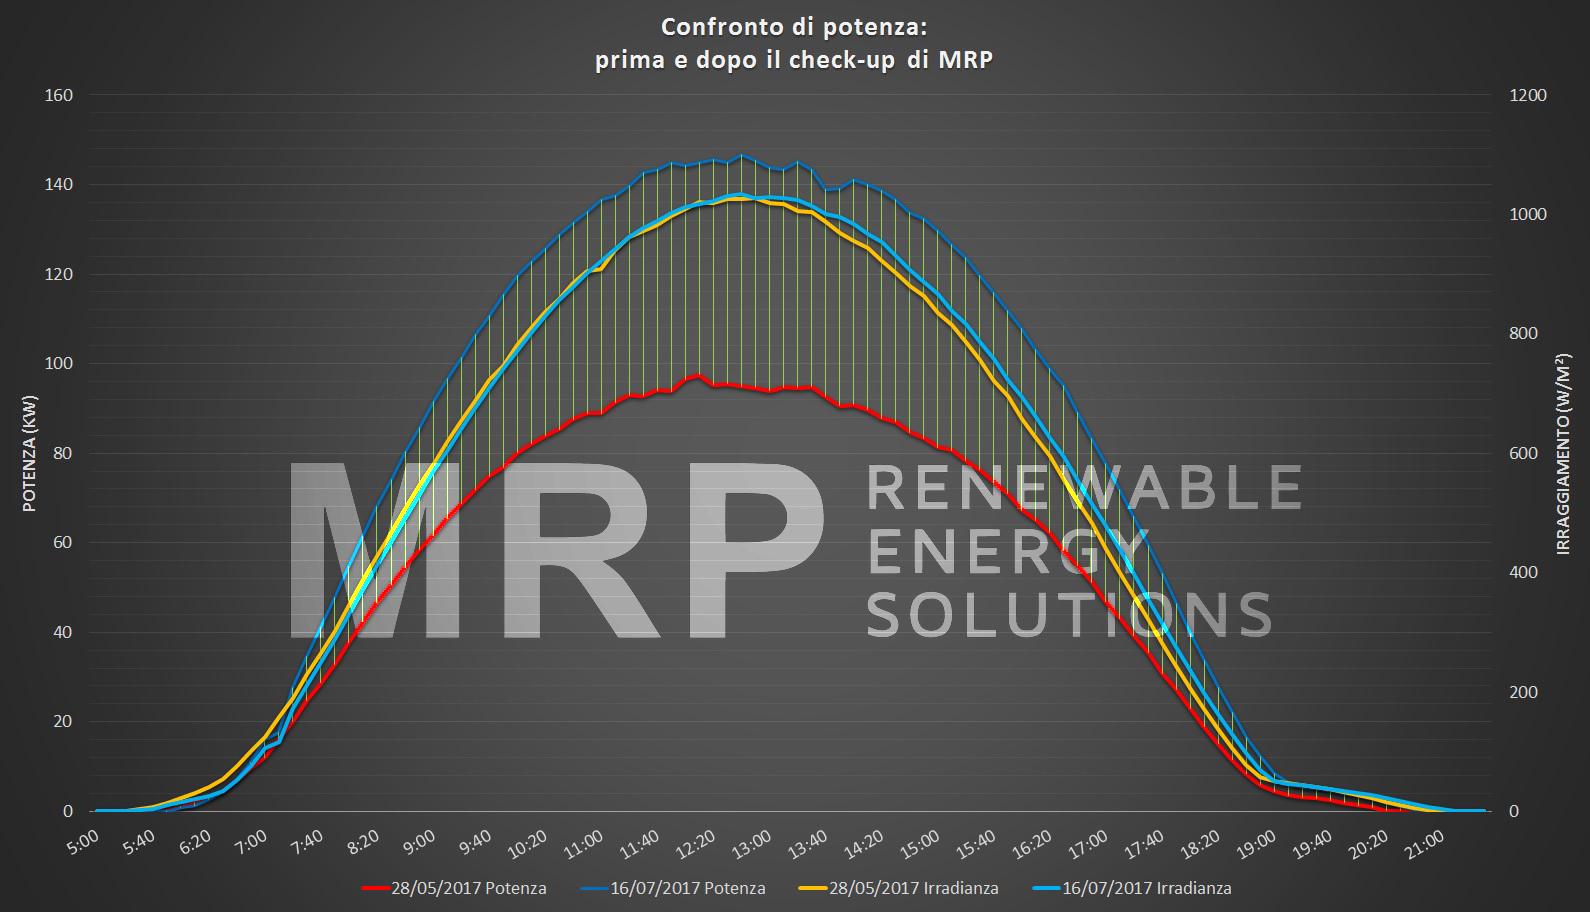 Grafico confronto efficienza fotovoltaico